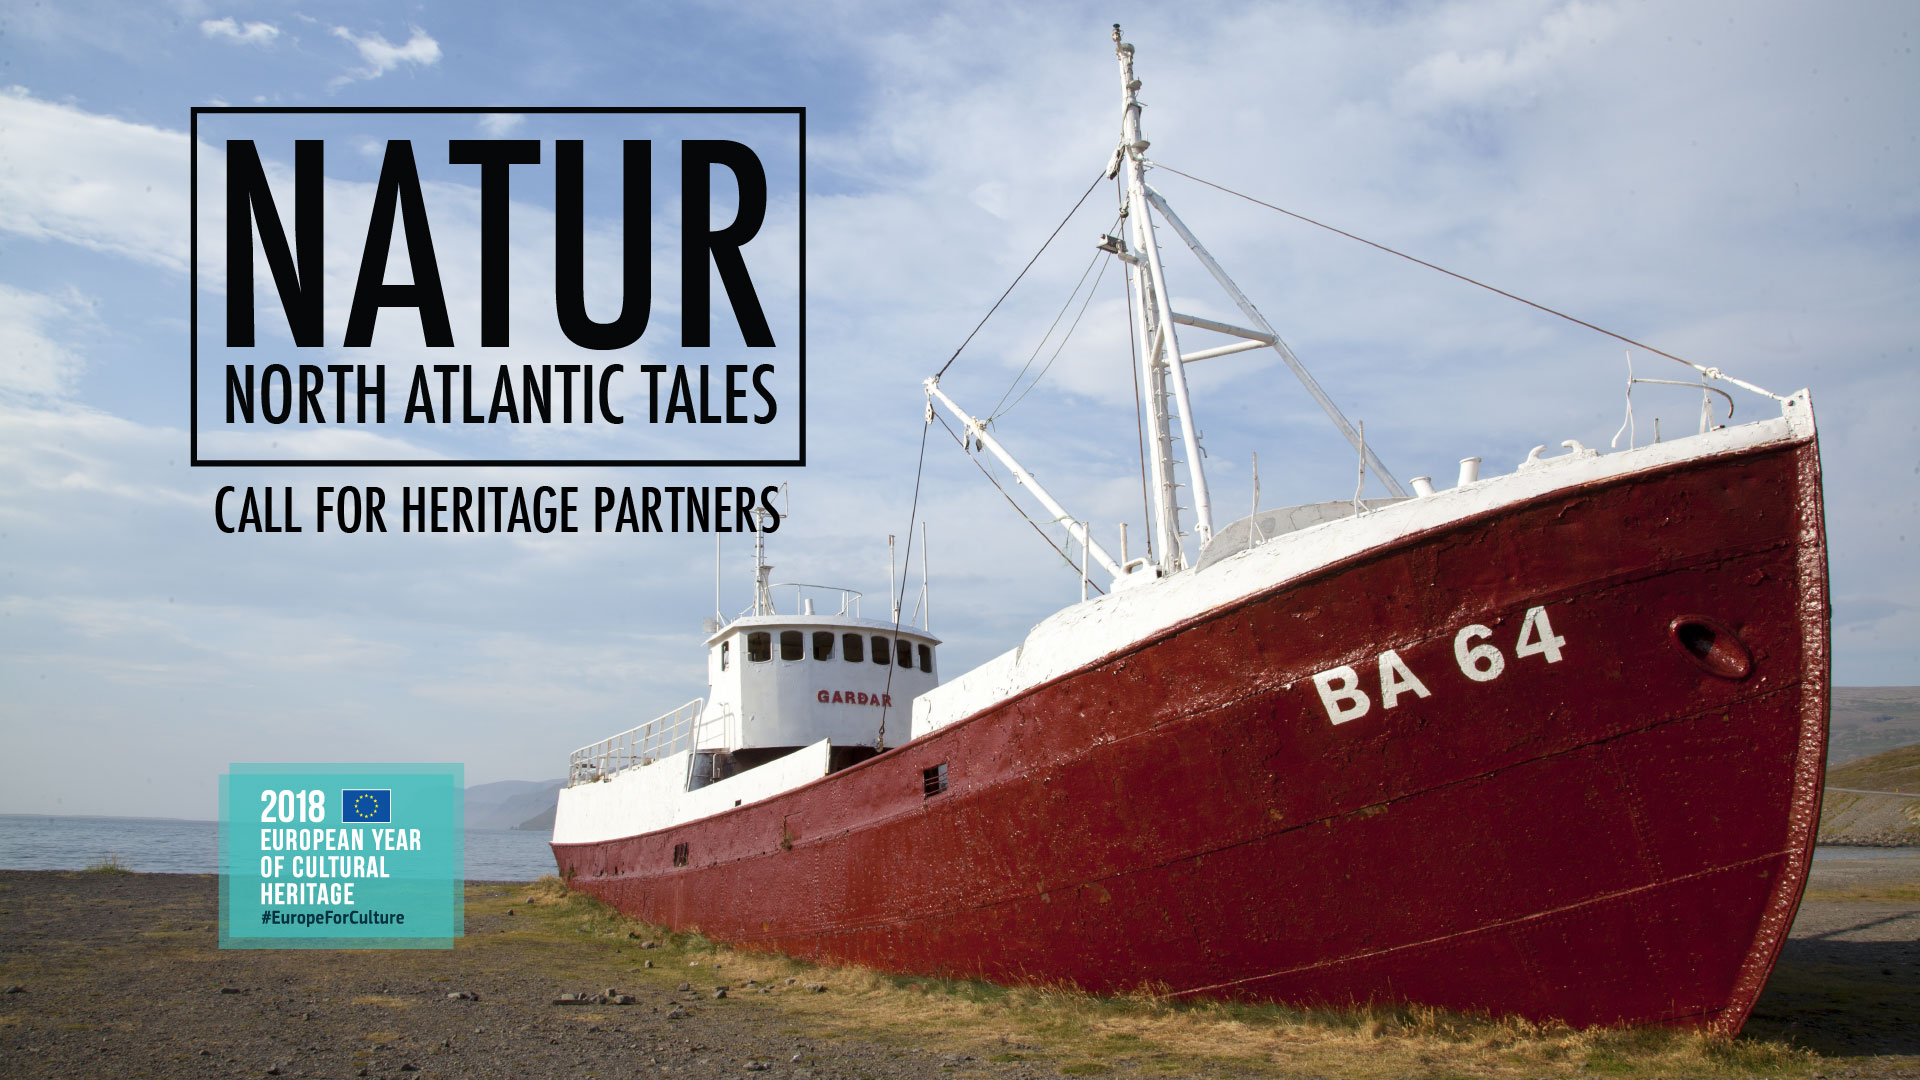 NATUR-Gardar-Boat-Grounded-EYCH-logo.jpg